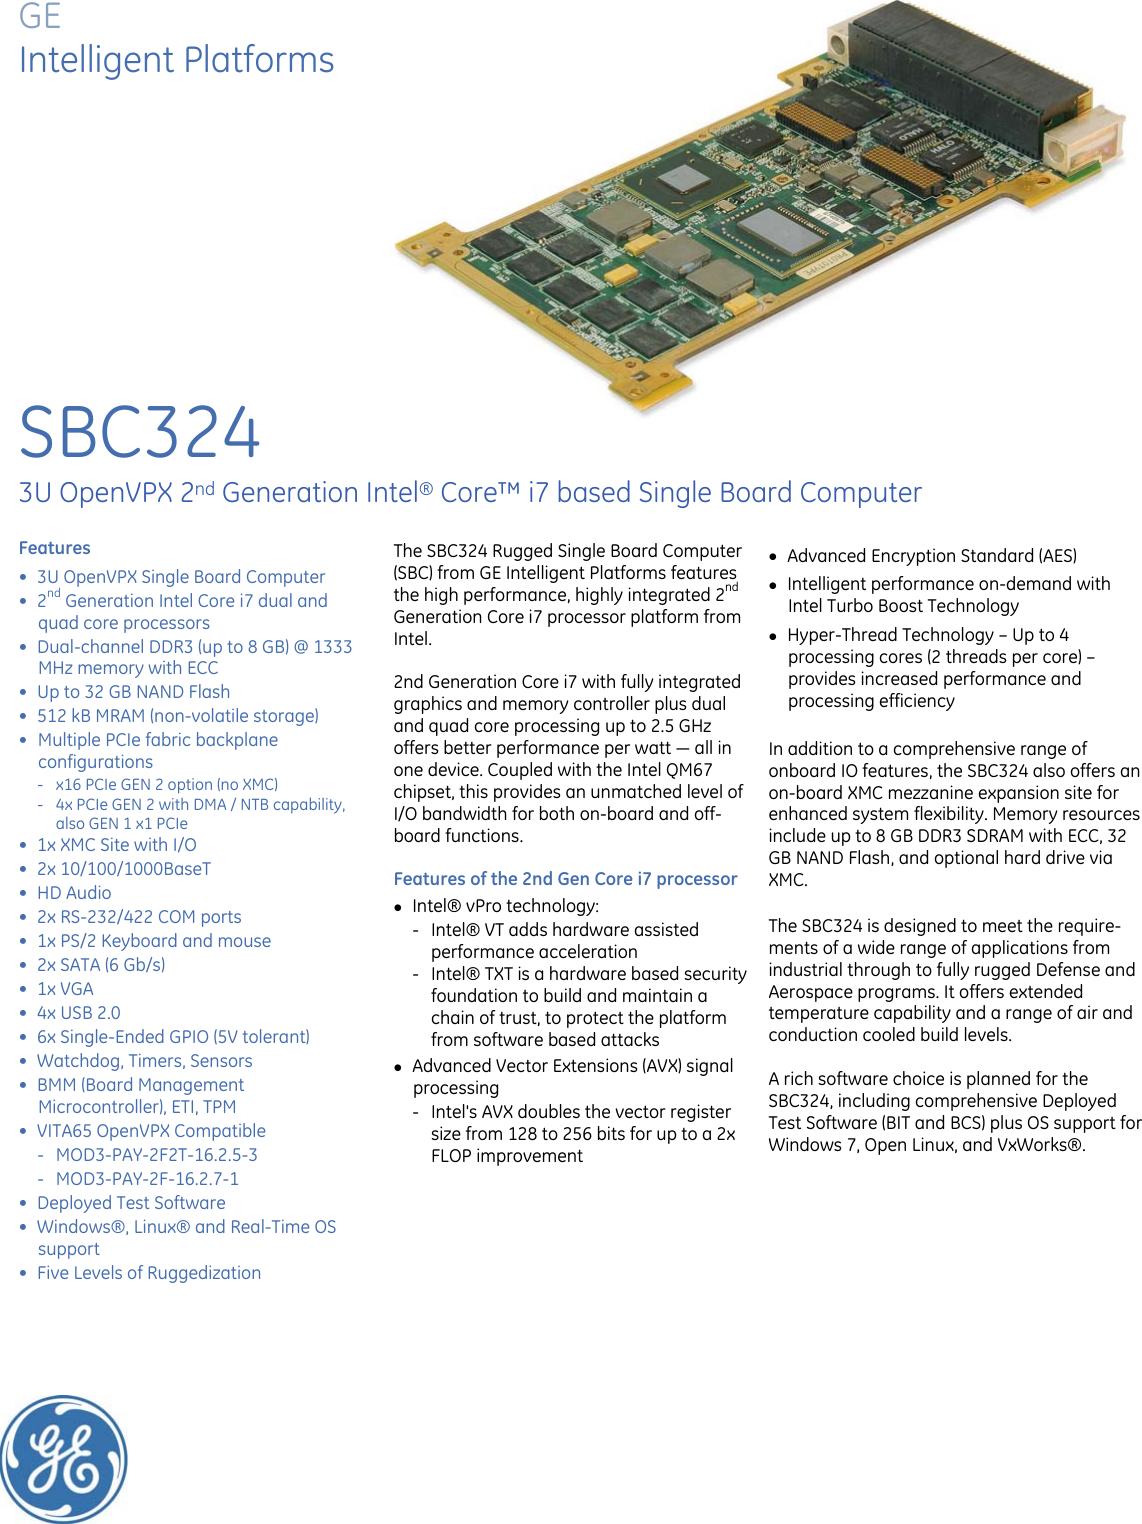 Ge Appliances Sbc324 3U Vpx Sbc Data Sheet Sbc324_ds_gfa1777_wip